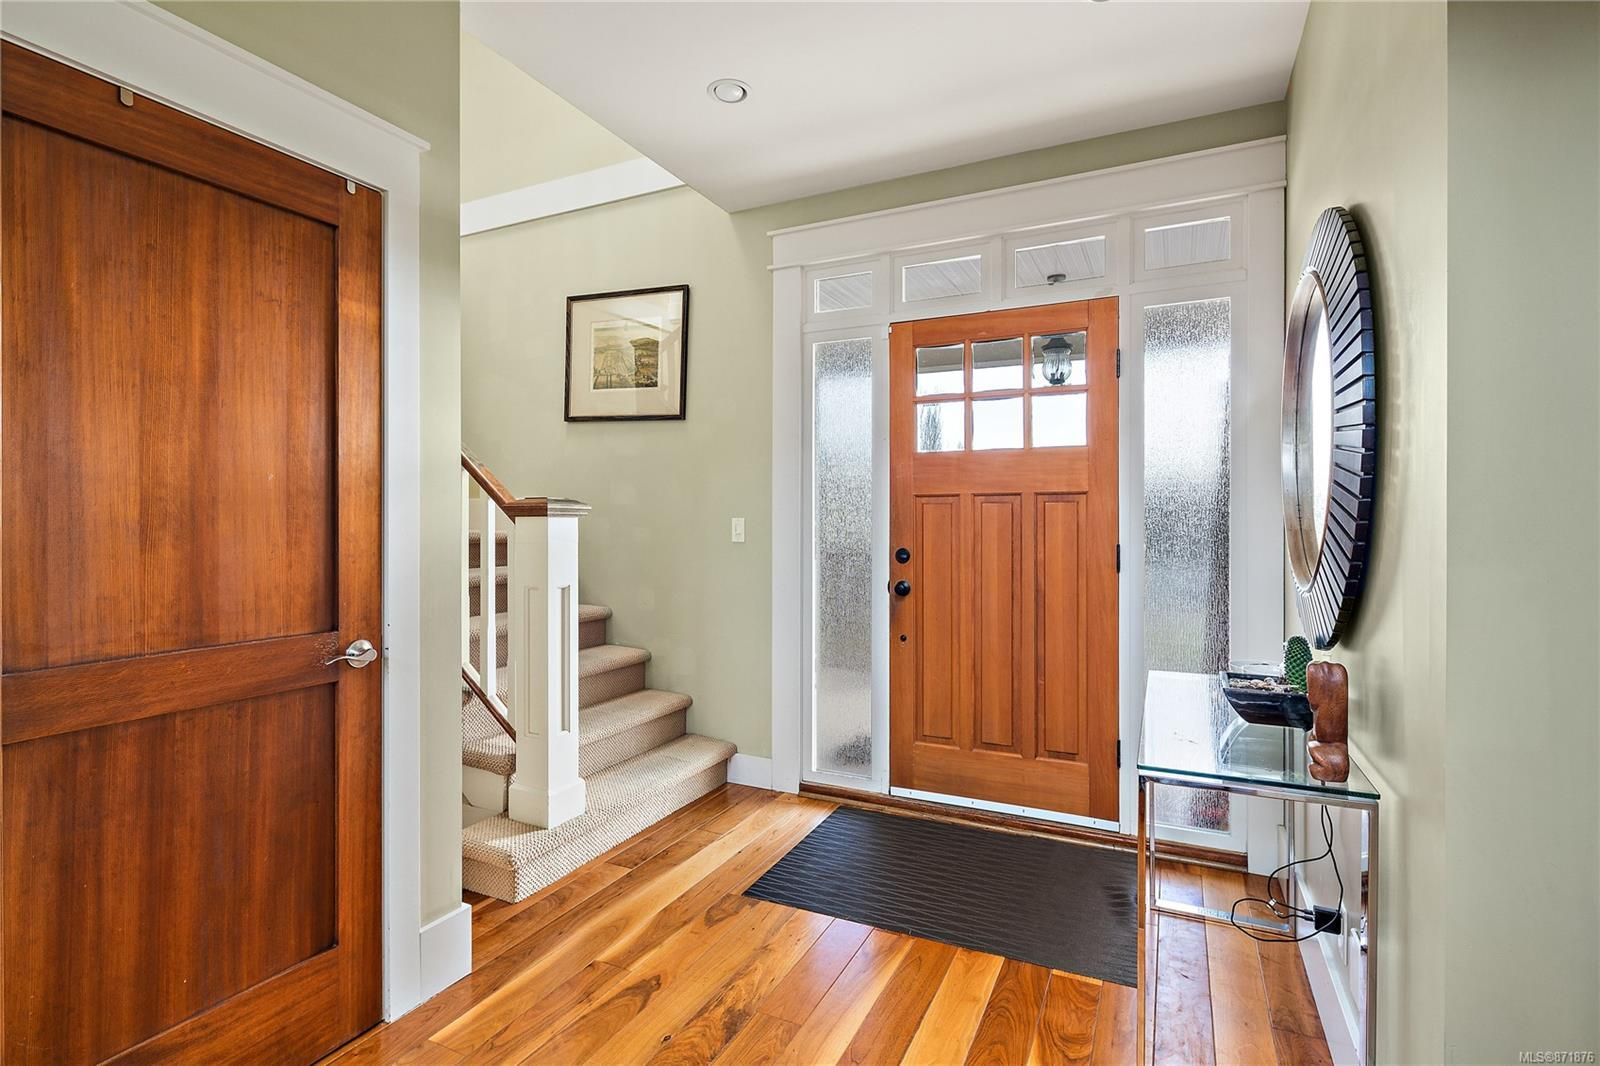 Photo 8: Photos: 4420 Wilkinson Rd in : SW Royal Oak House for sale (Saanich West)  : MLS®# 871876